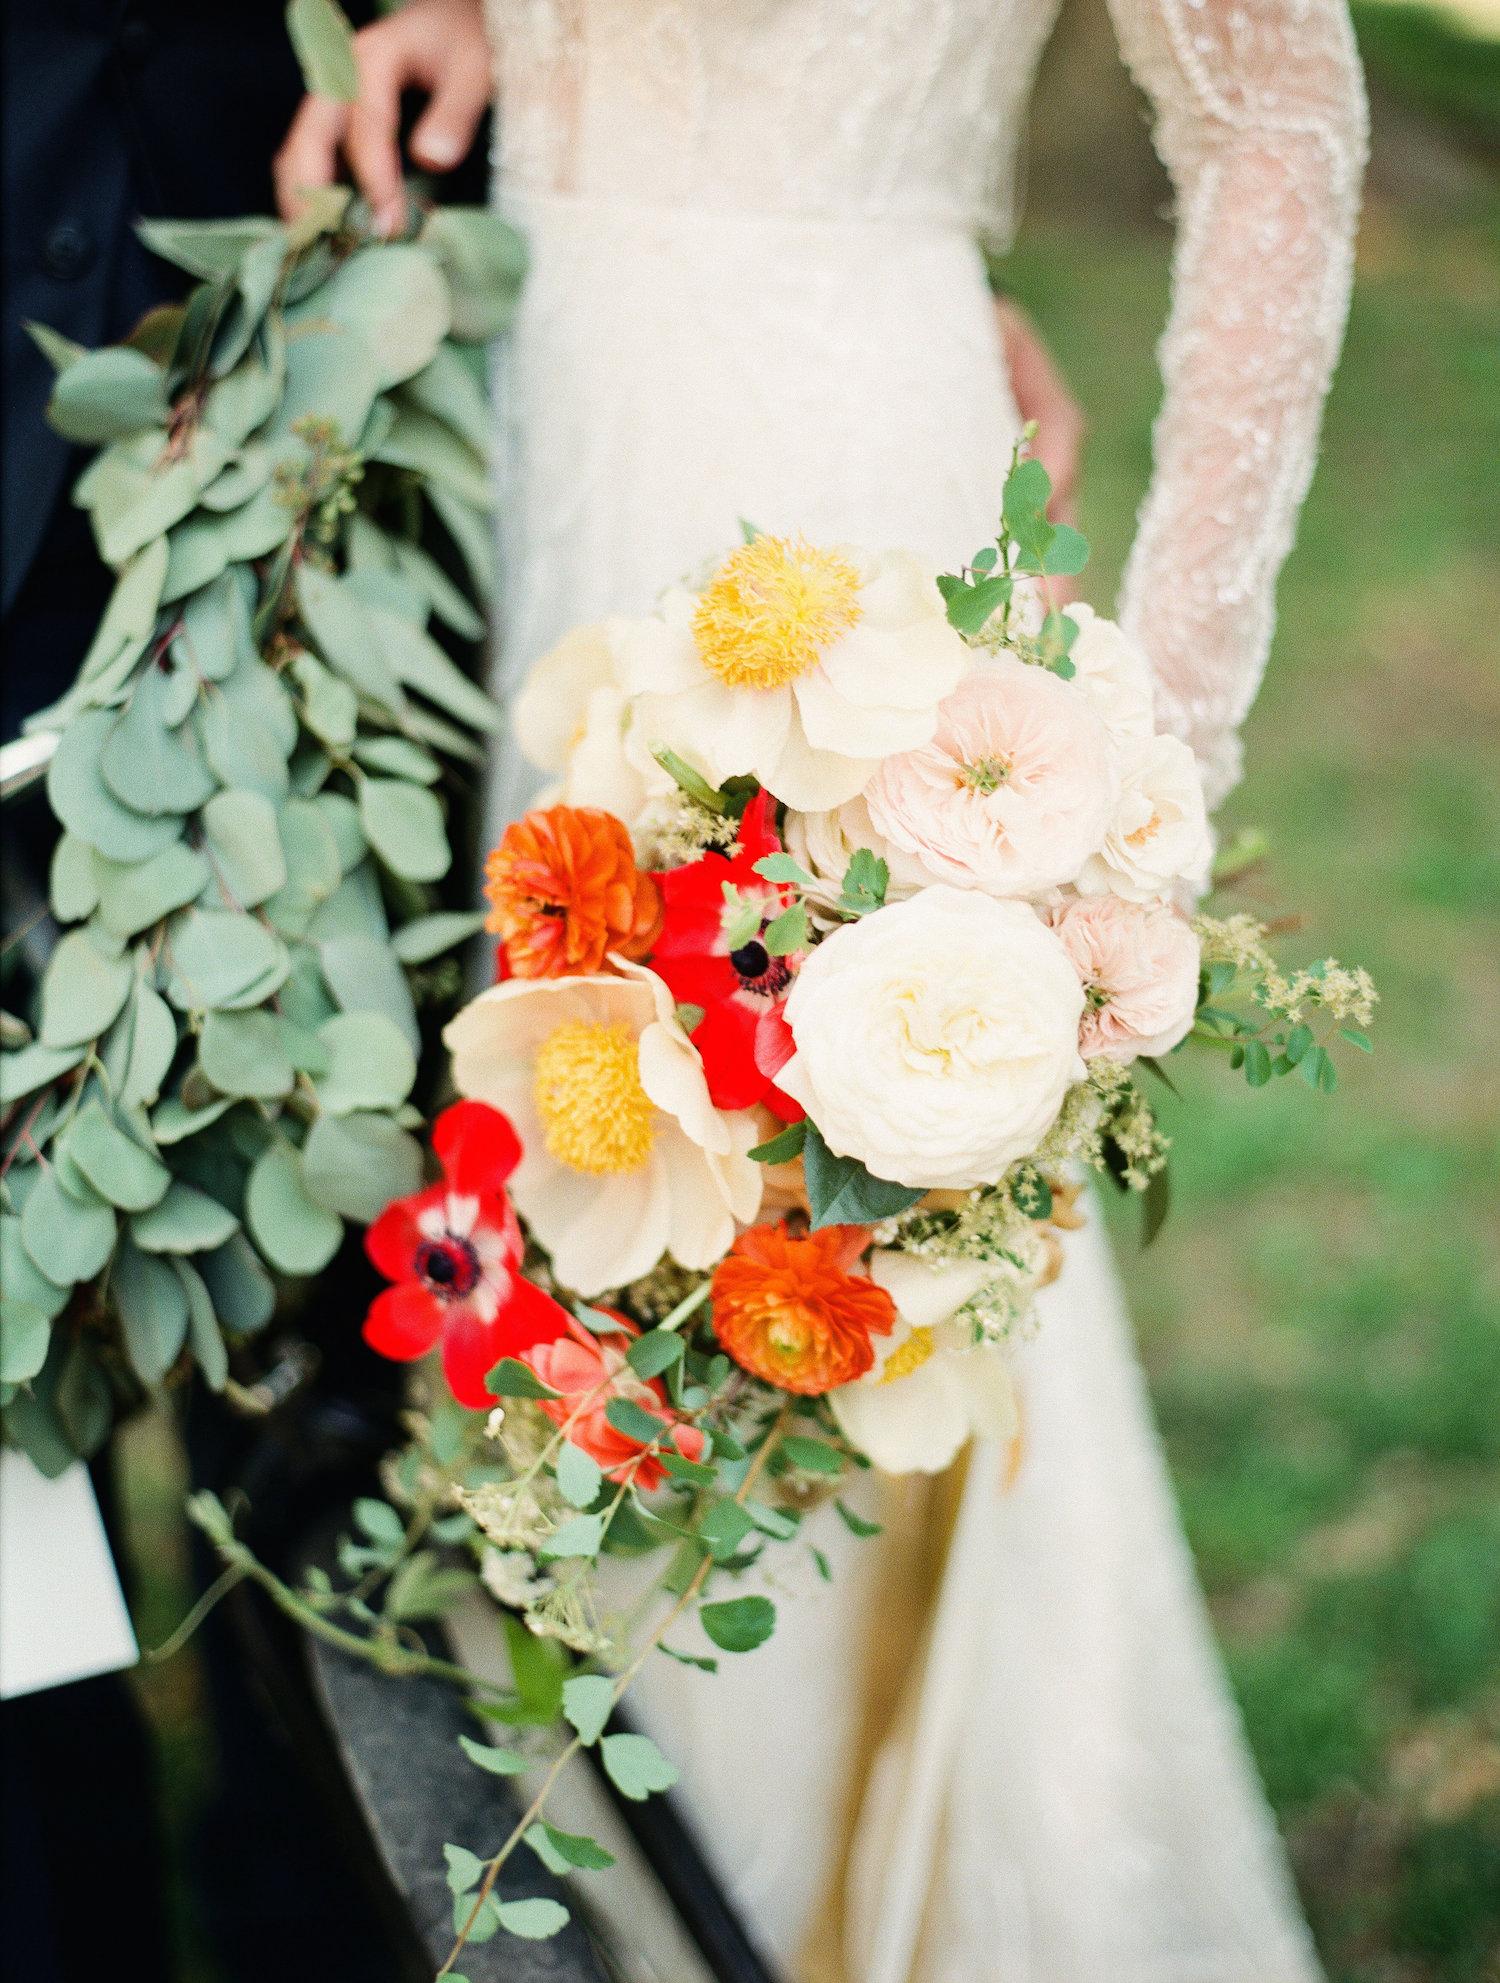 Morning Glow - Full Aperture Floral & Lindsay Madden Photography 125.jpeg